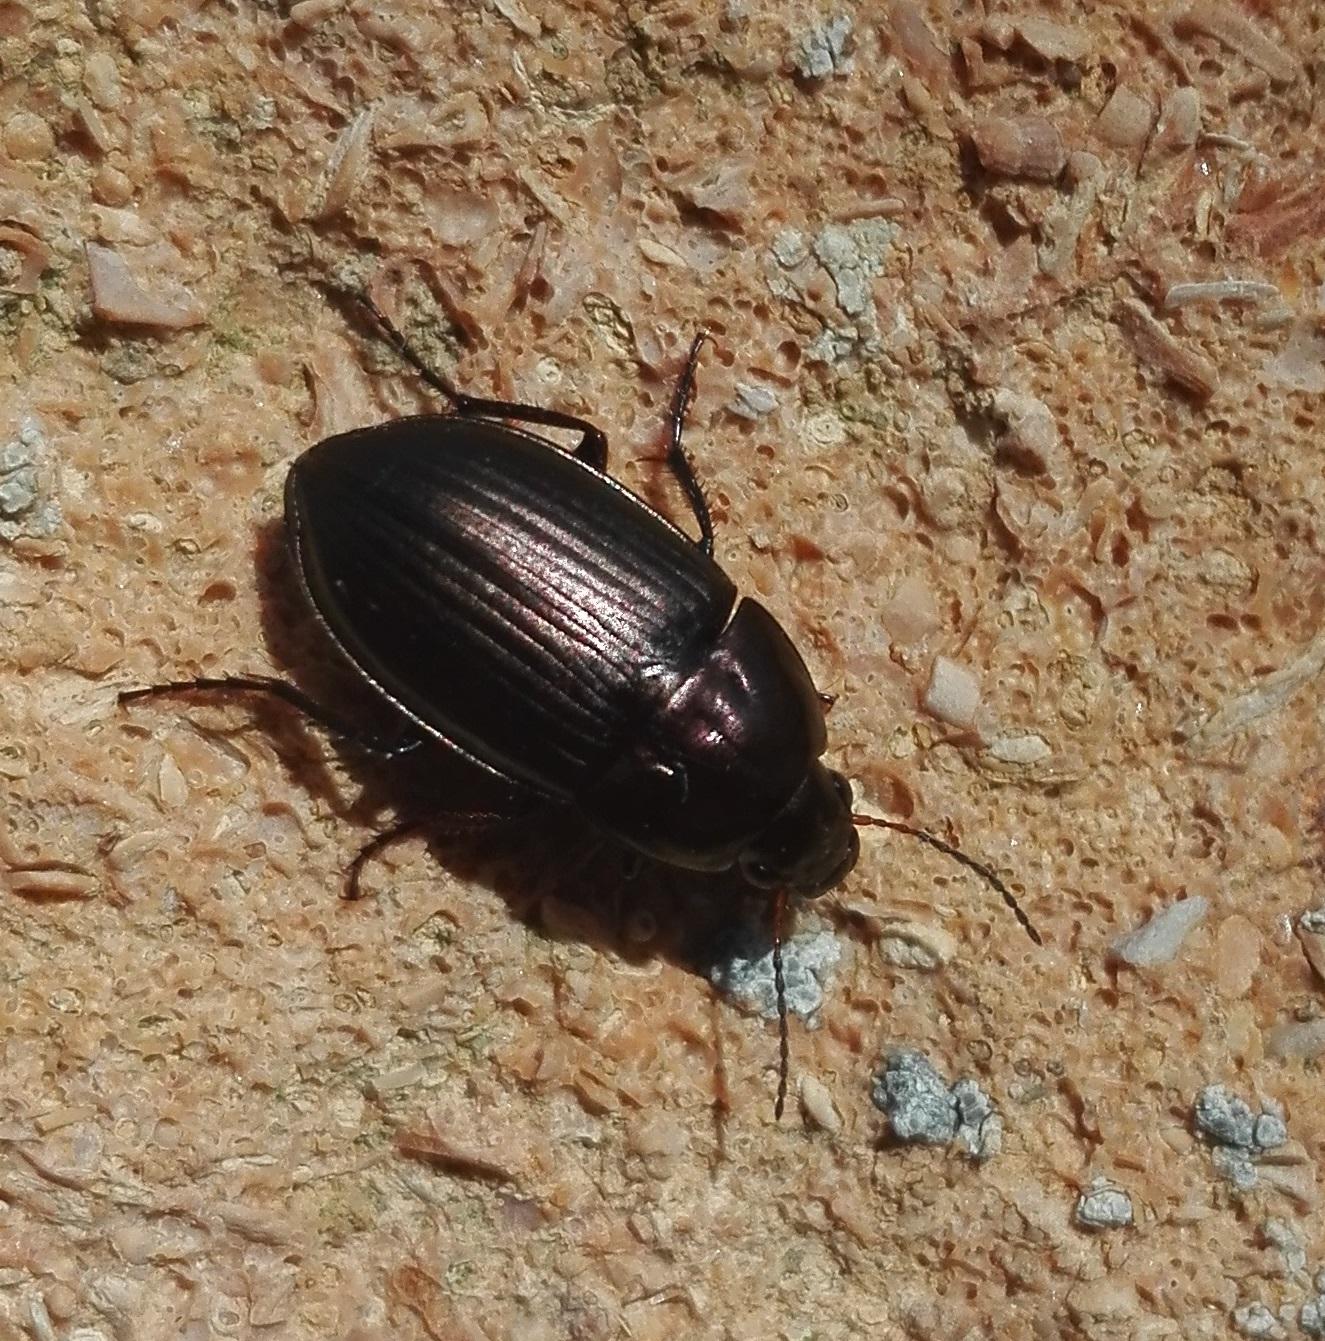 352 Amara sp ground beetle 2.jpg